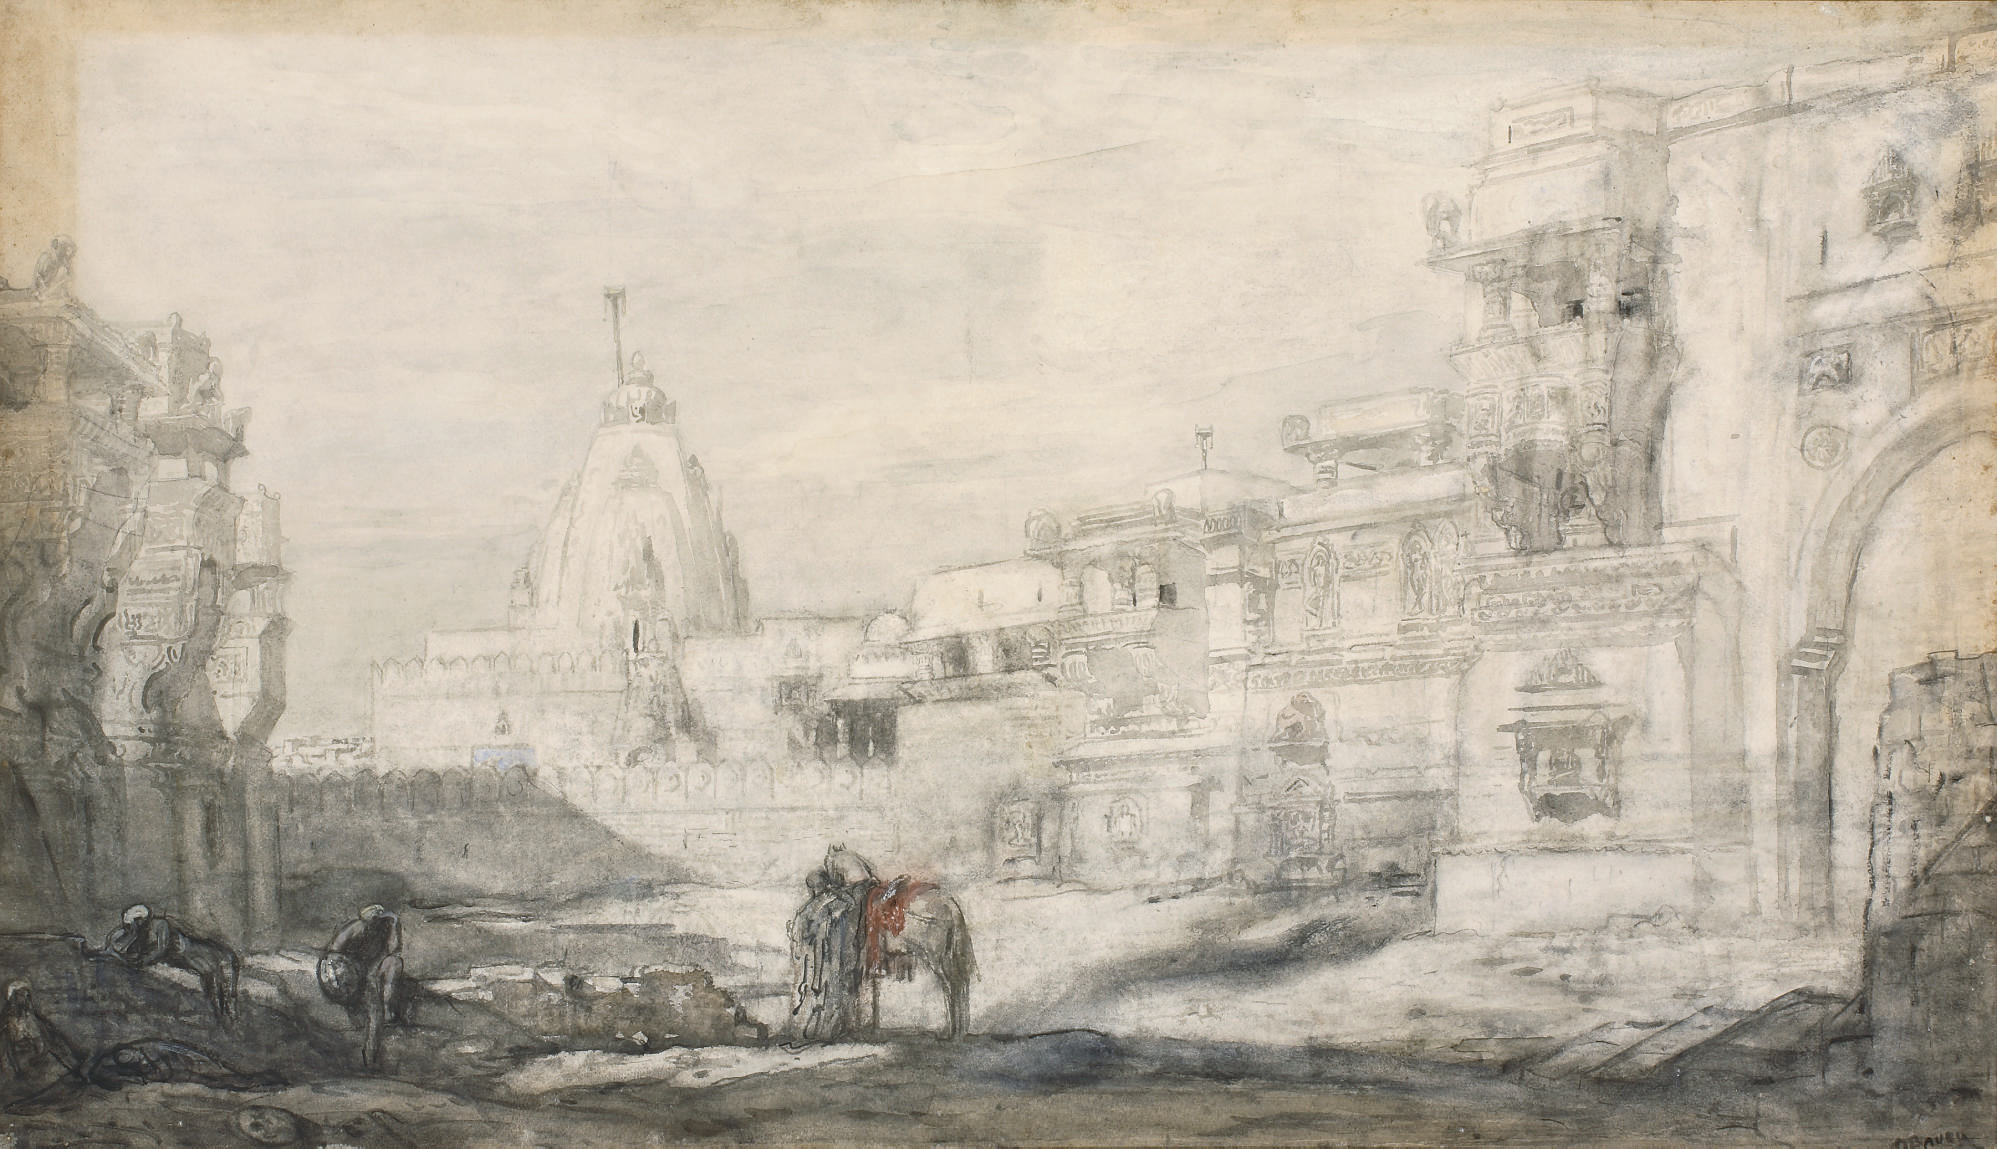 Hindoetempel: arriving at the Palitana temples, Gujarat, India